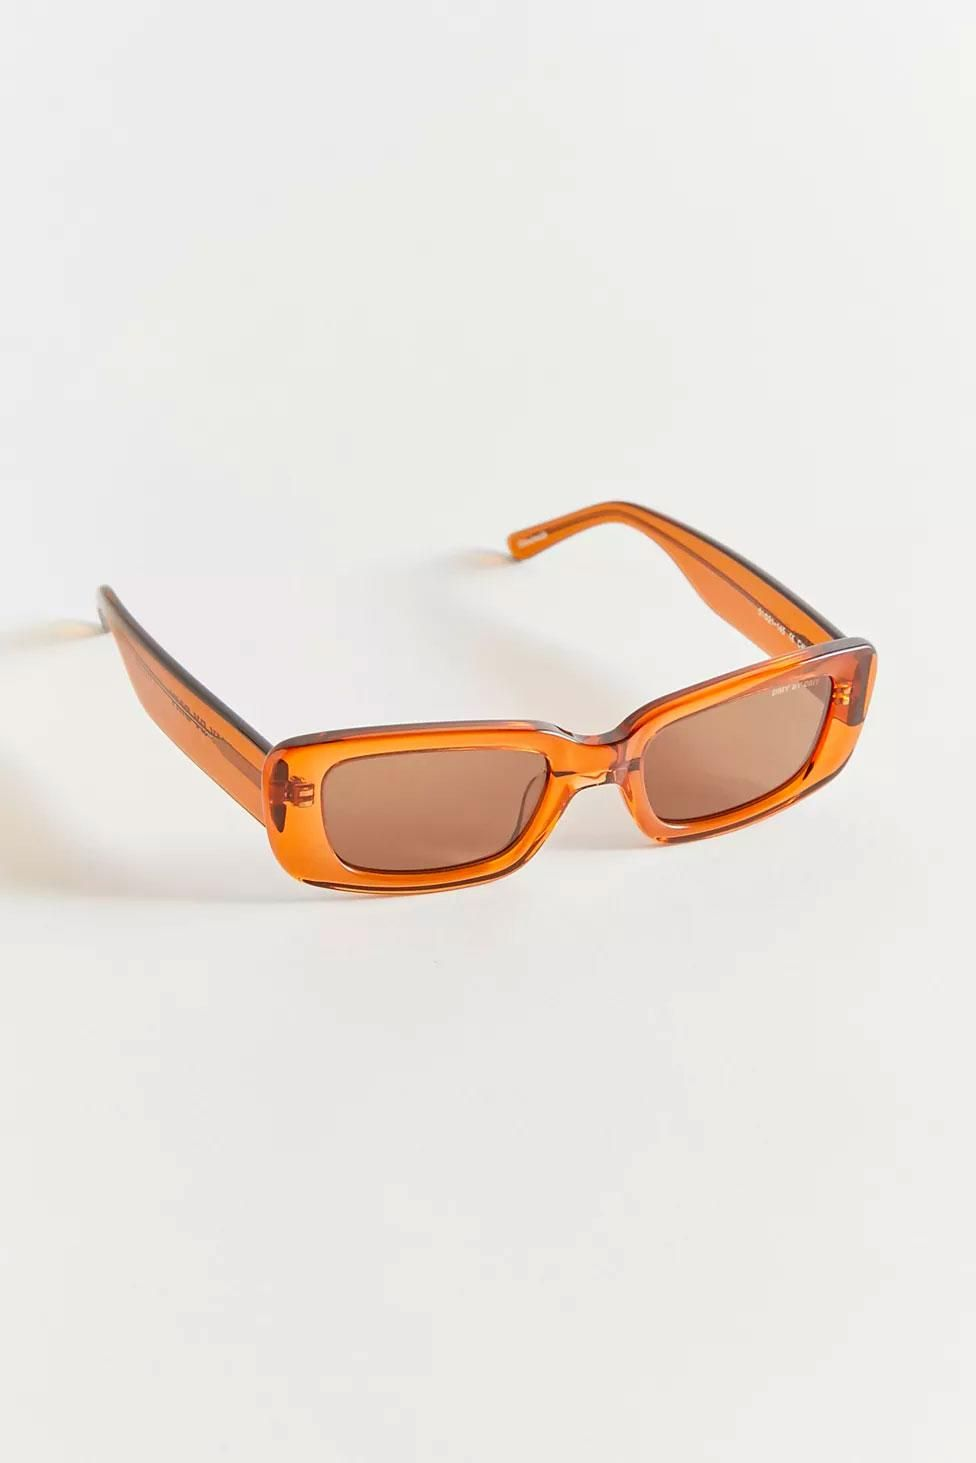 dmy by dmy preston rectangle sunglasses